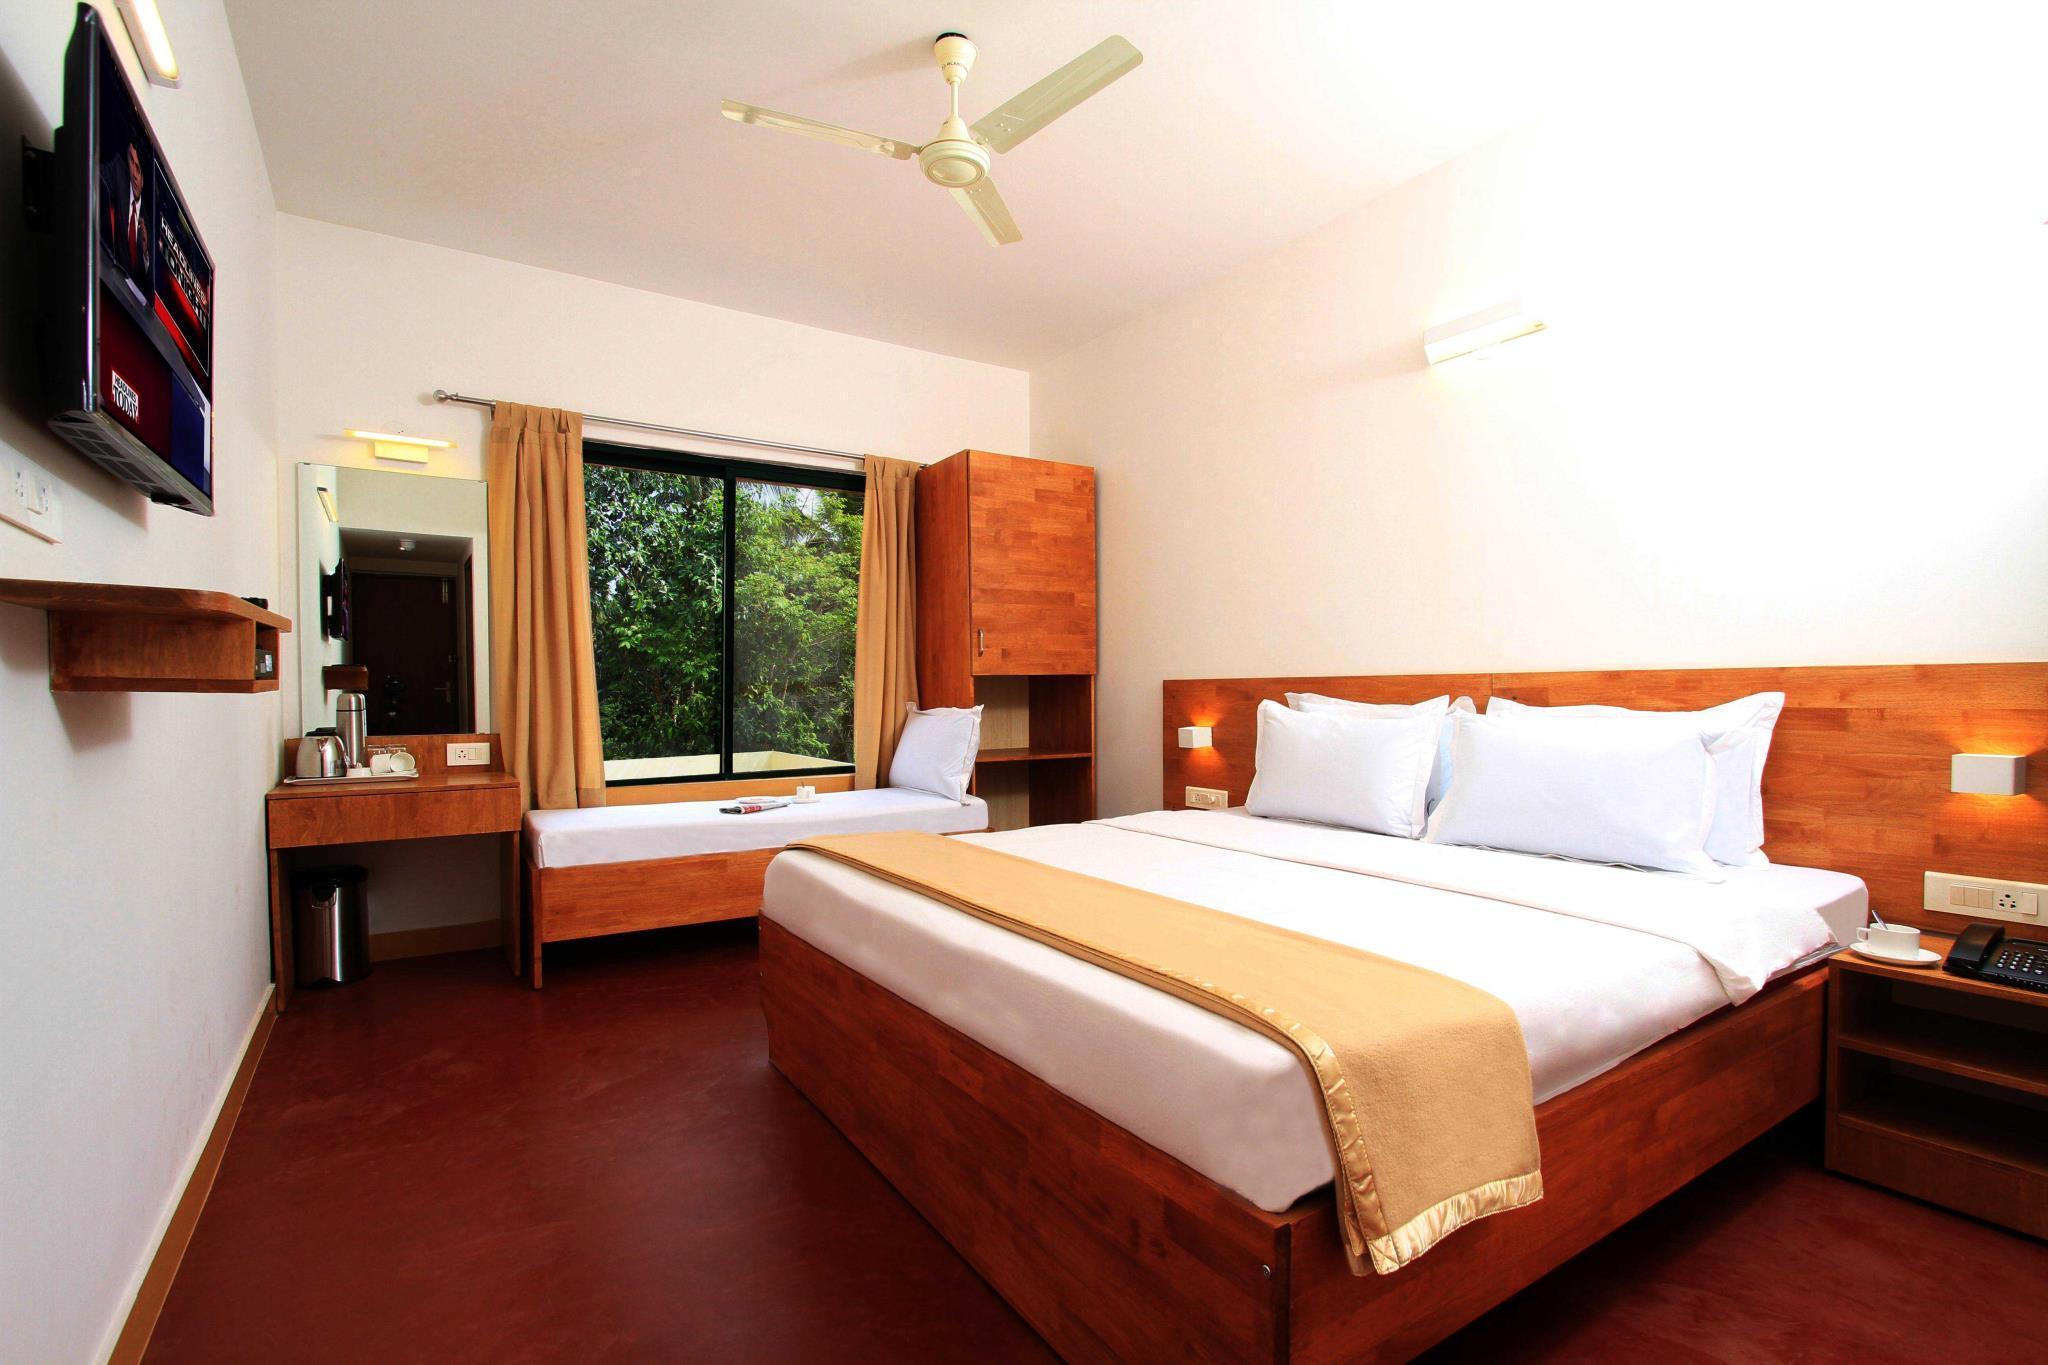 Reviews Hotel Dwara, Kukke Subrahmanya